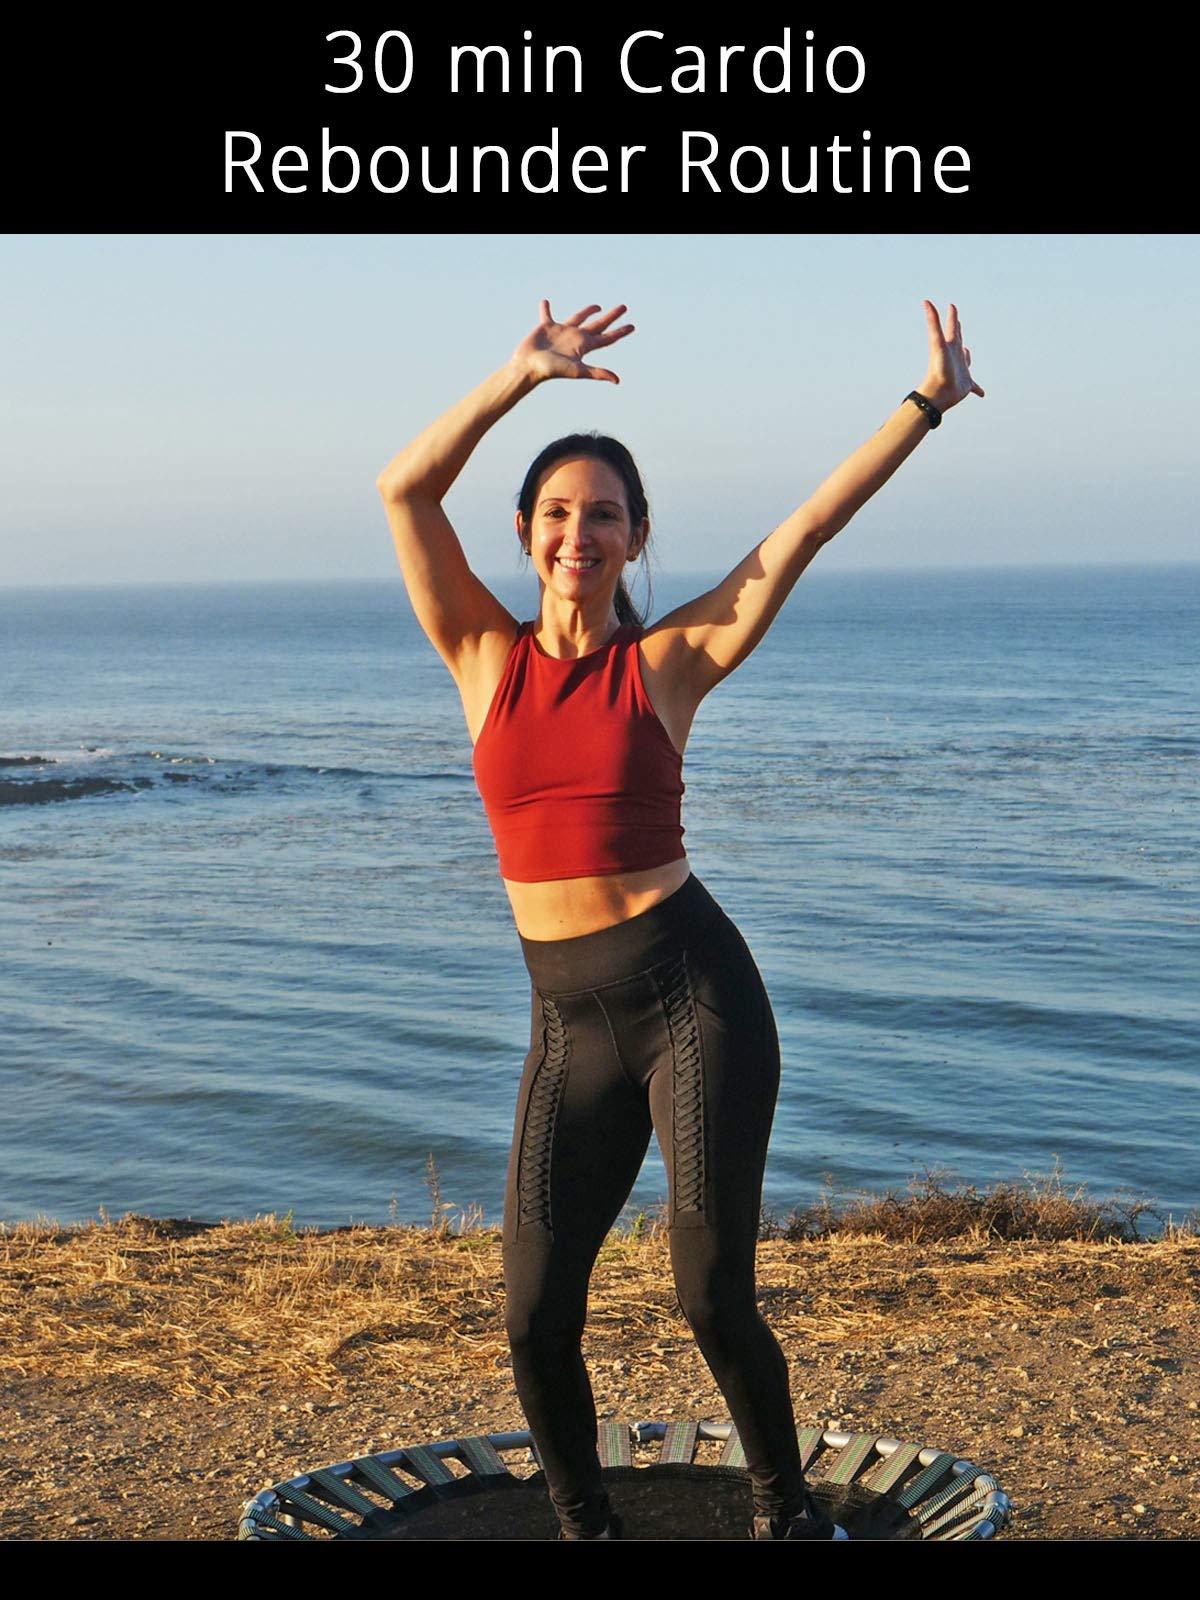 30 min Cardio Rebounder Routine